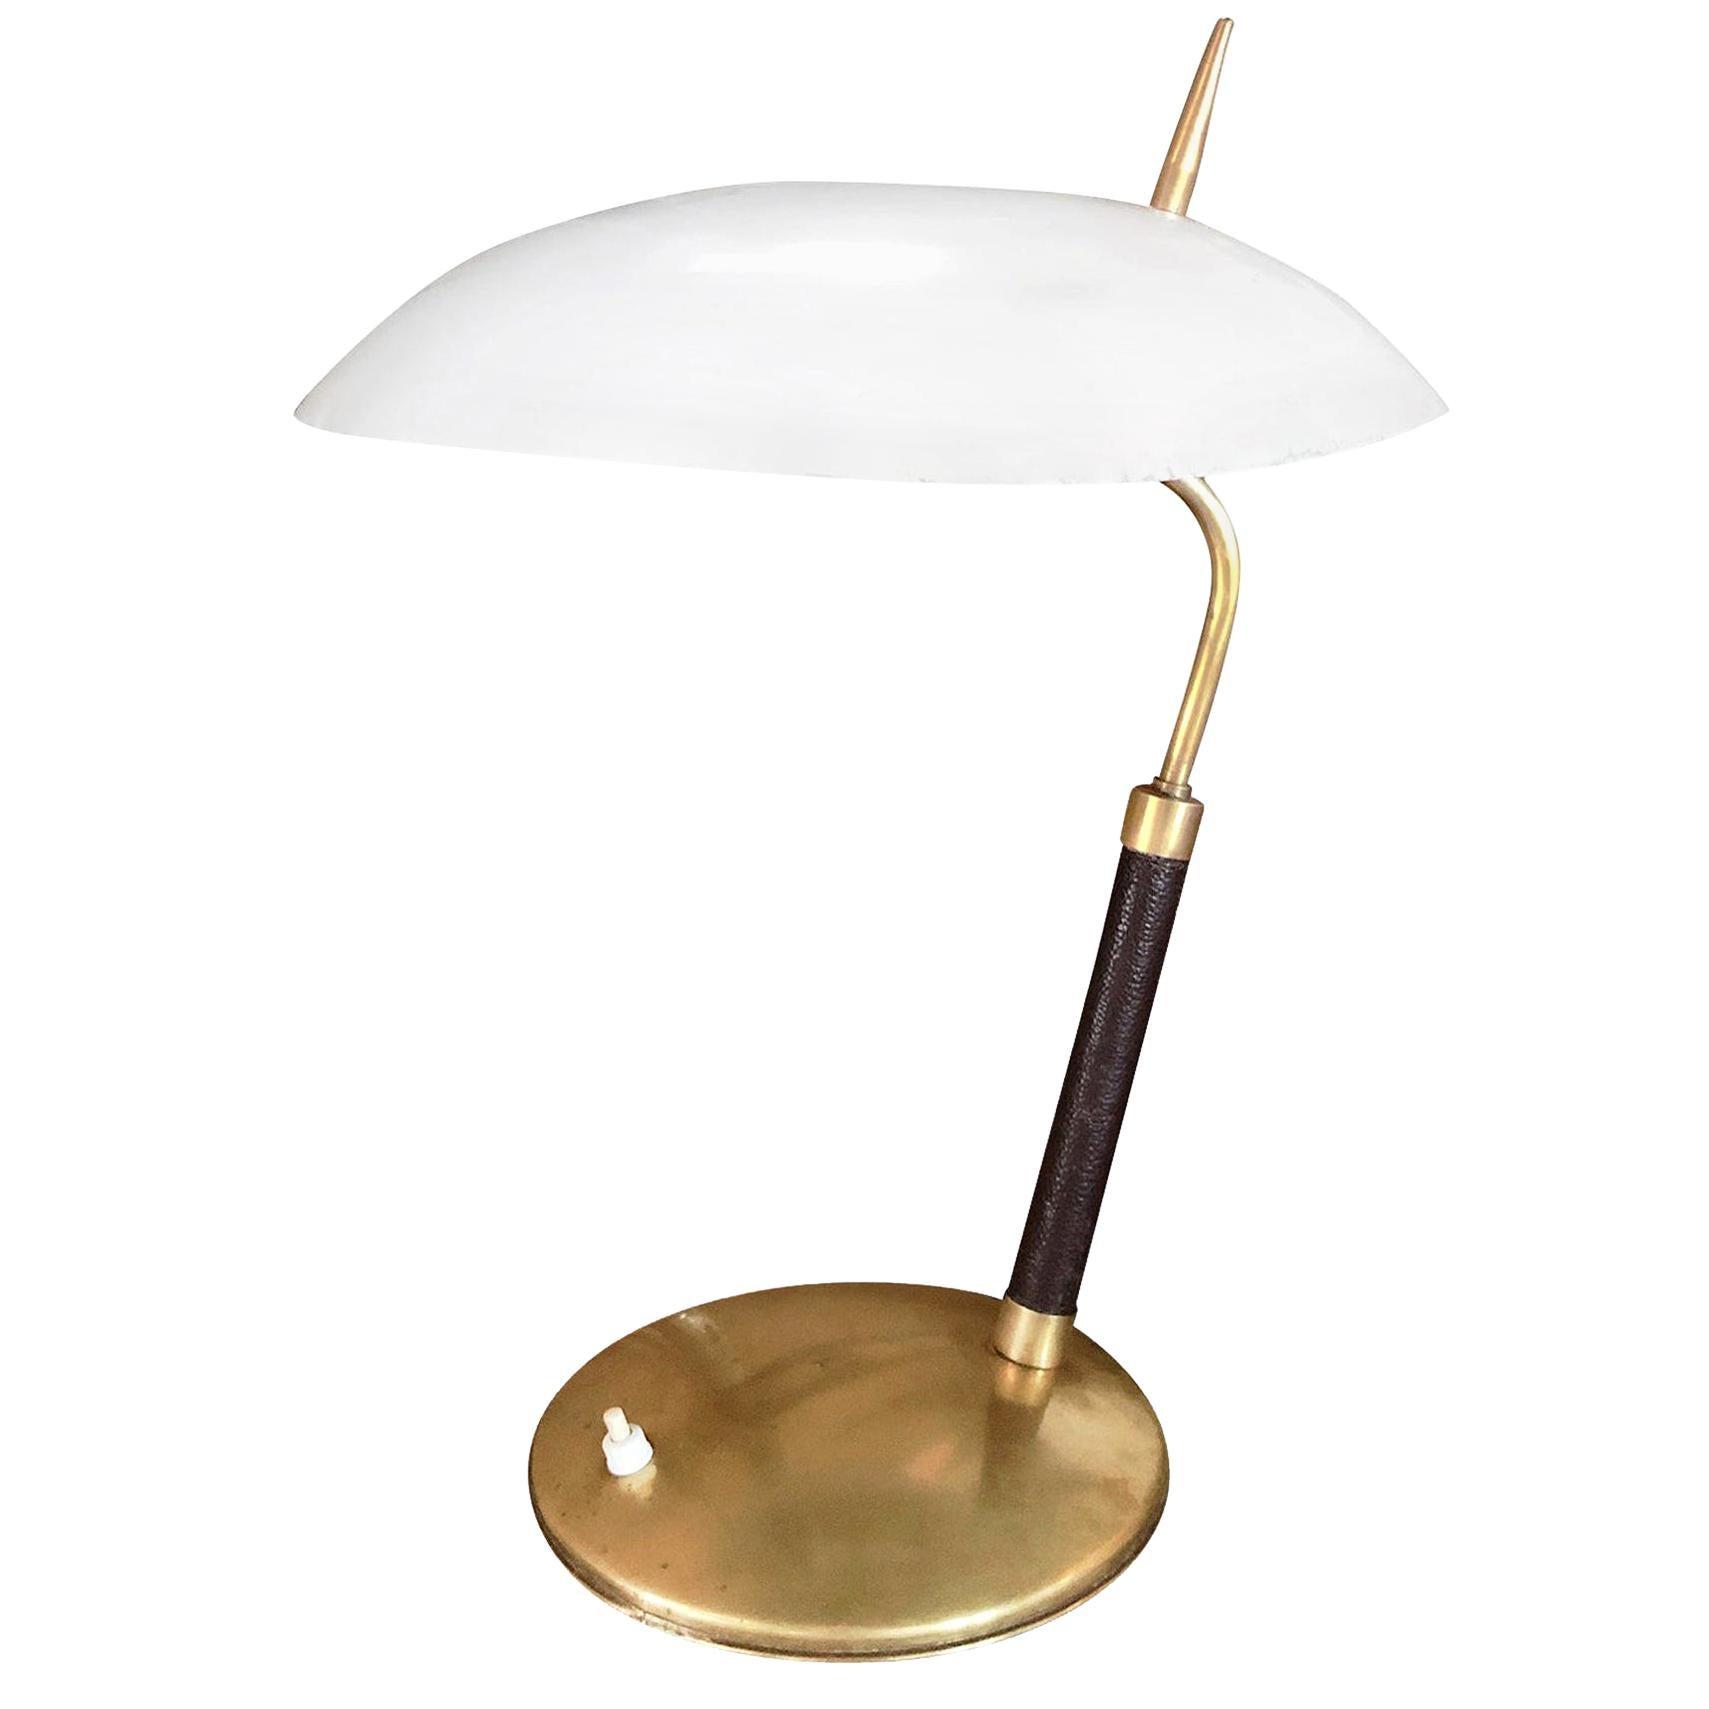 20th Century White Italian Leather Table Lamp - Brass Light by Stilnovo